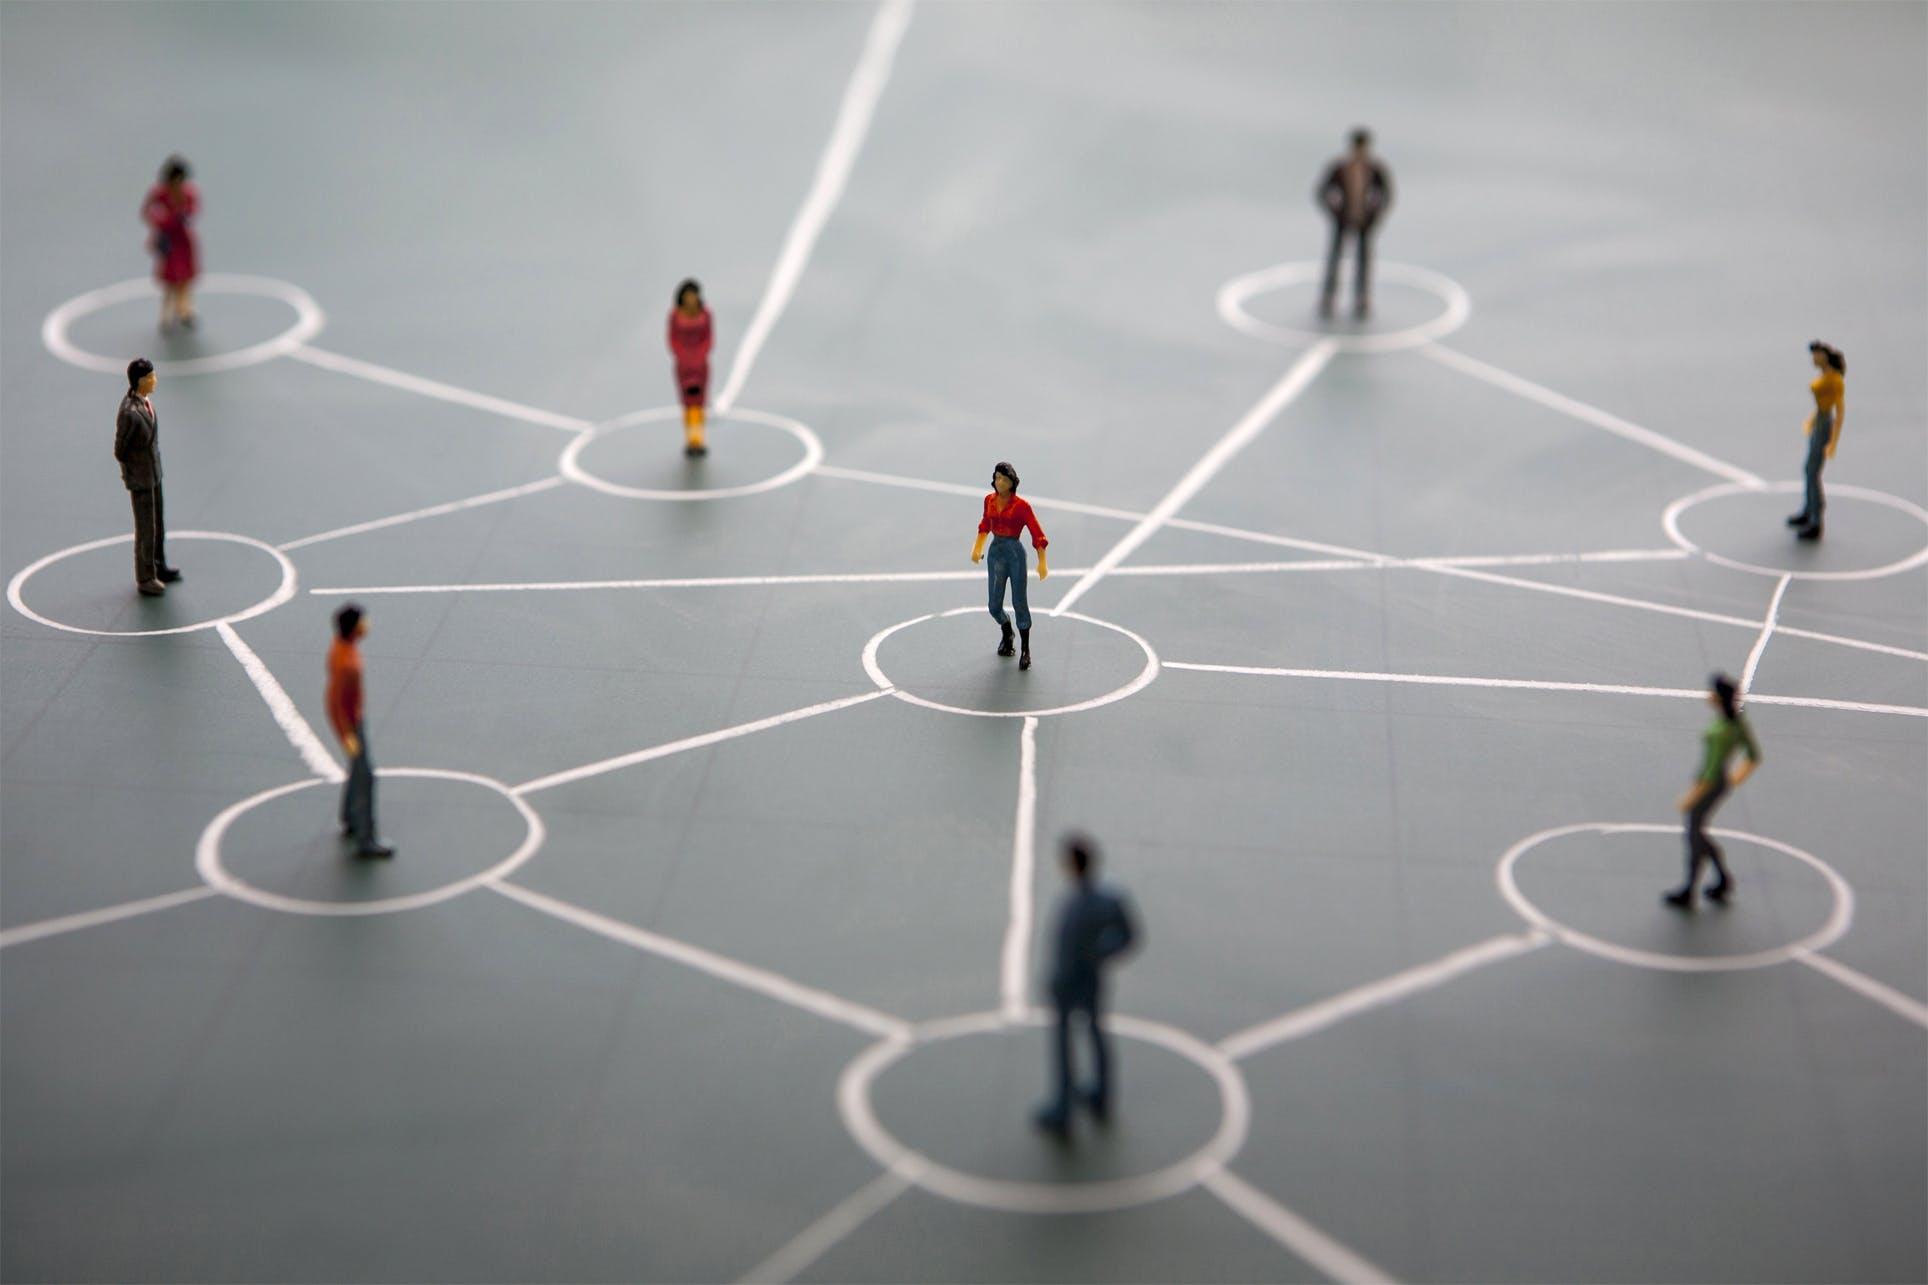 miniature model people standing on drawn chalk network